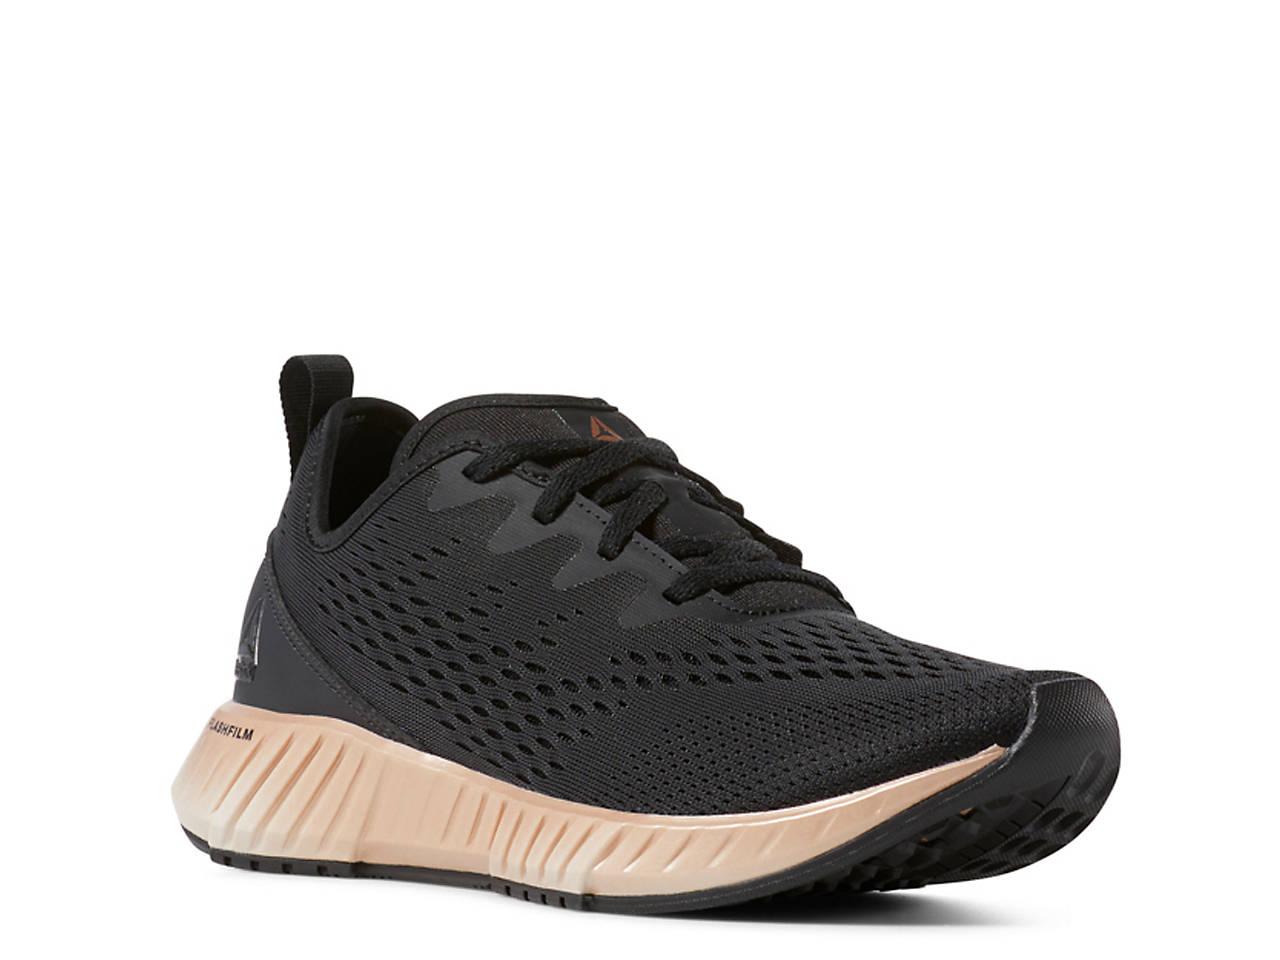 8dd1defe2 Reebok Flash Film Running Shoe - Women s Women s Shoes